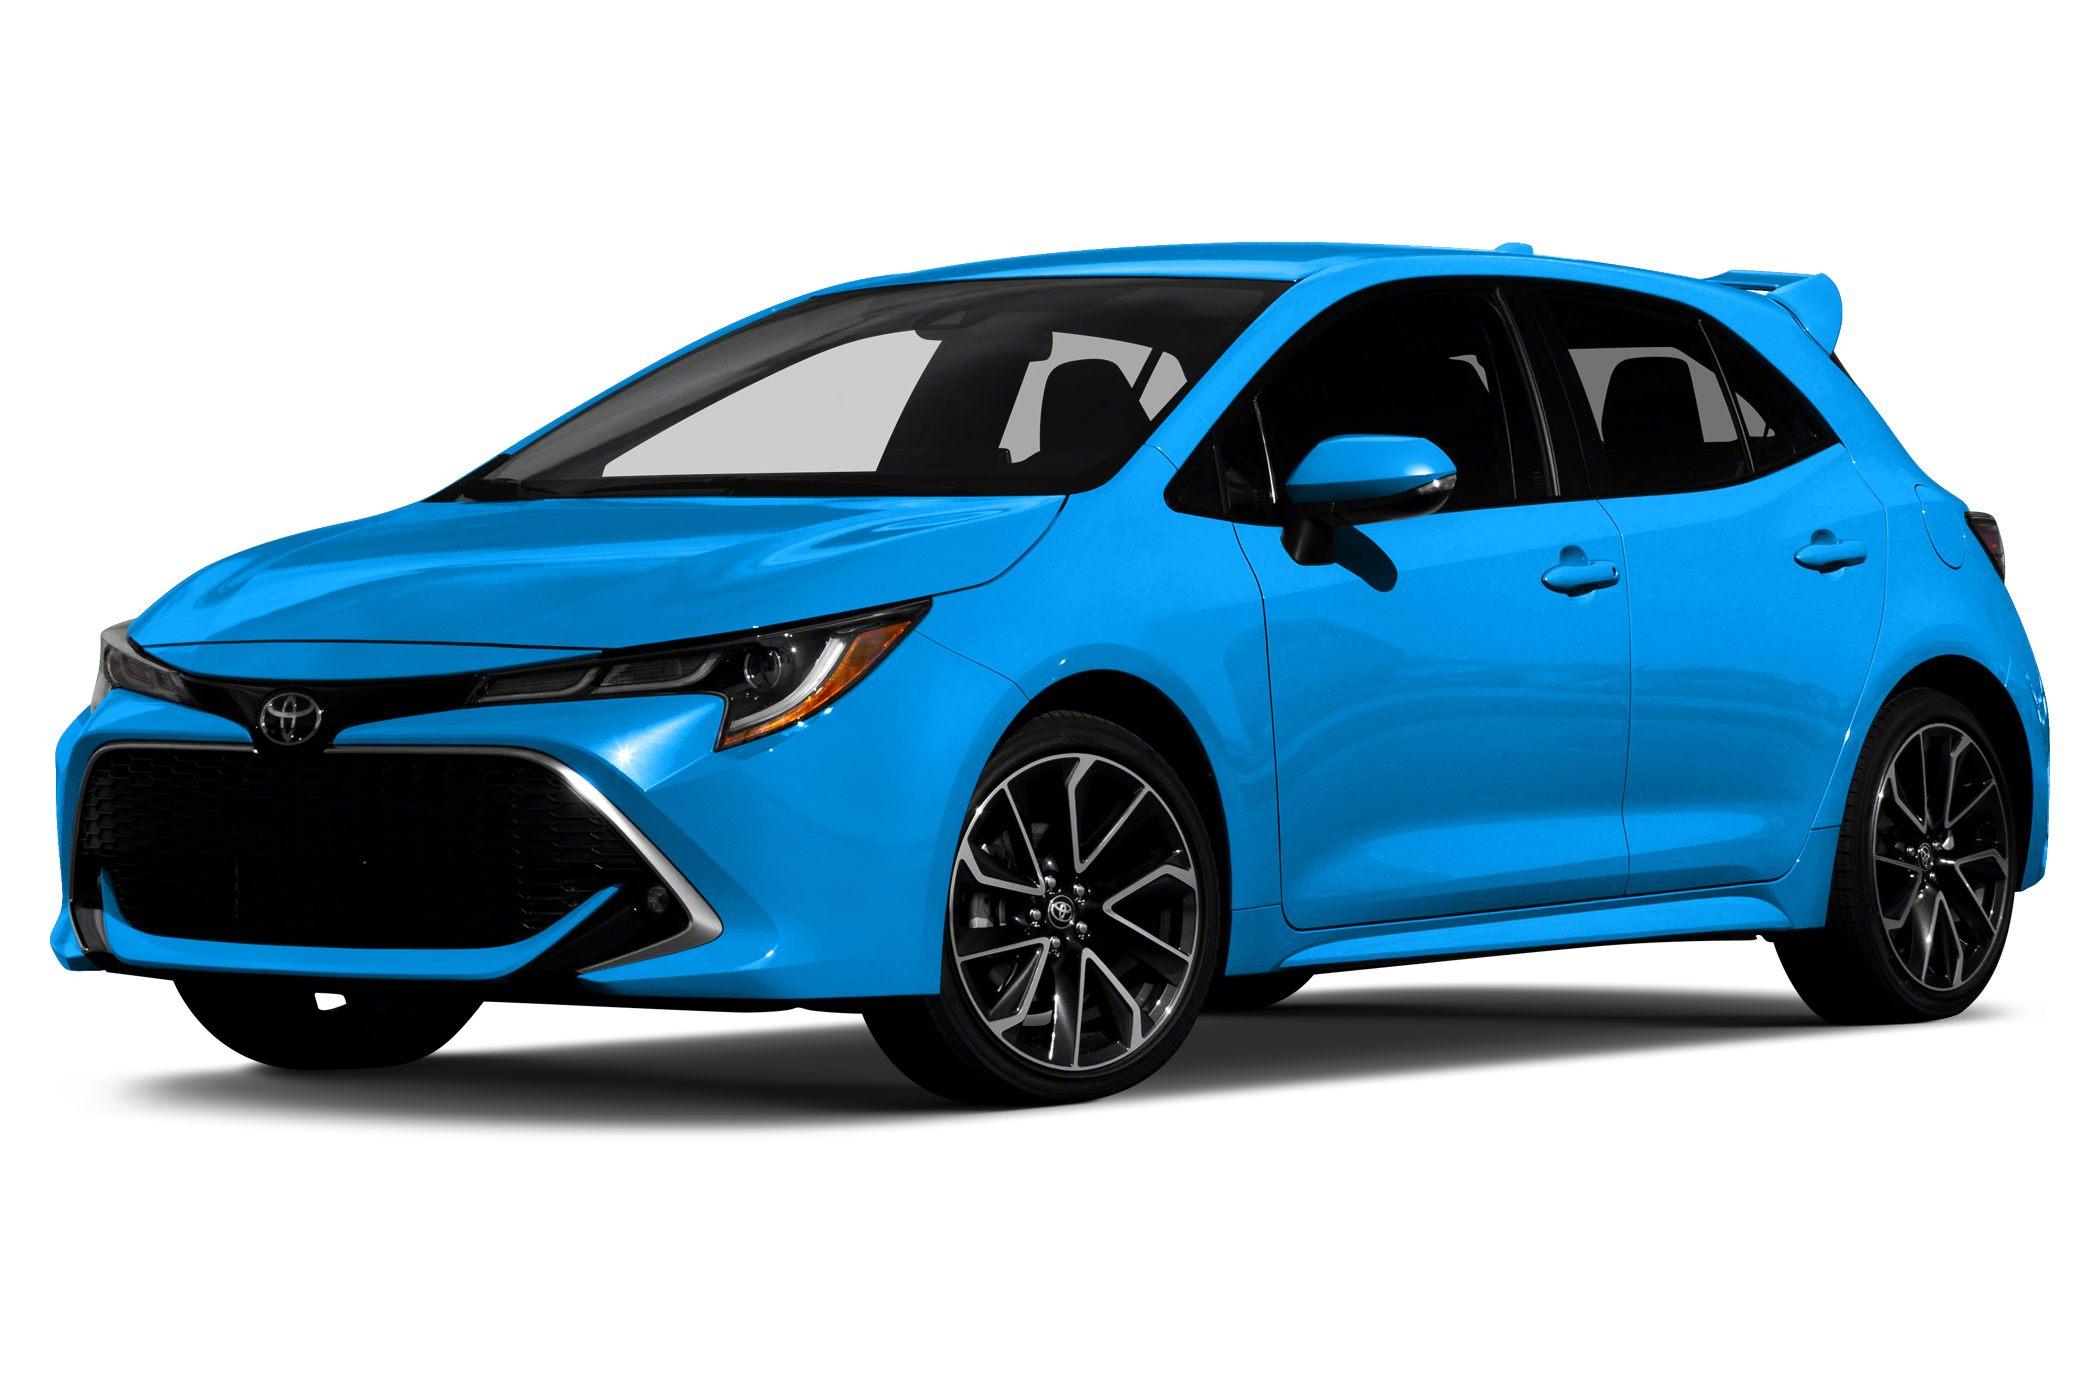 New 2019 Toyota Corolla Hatchback.